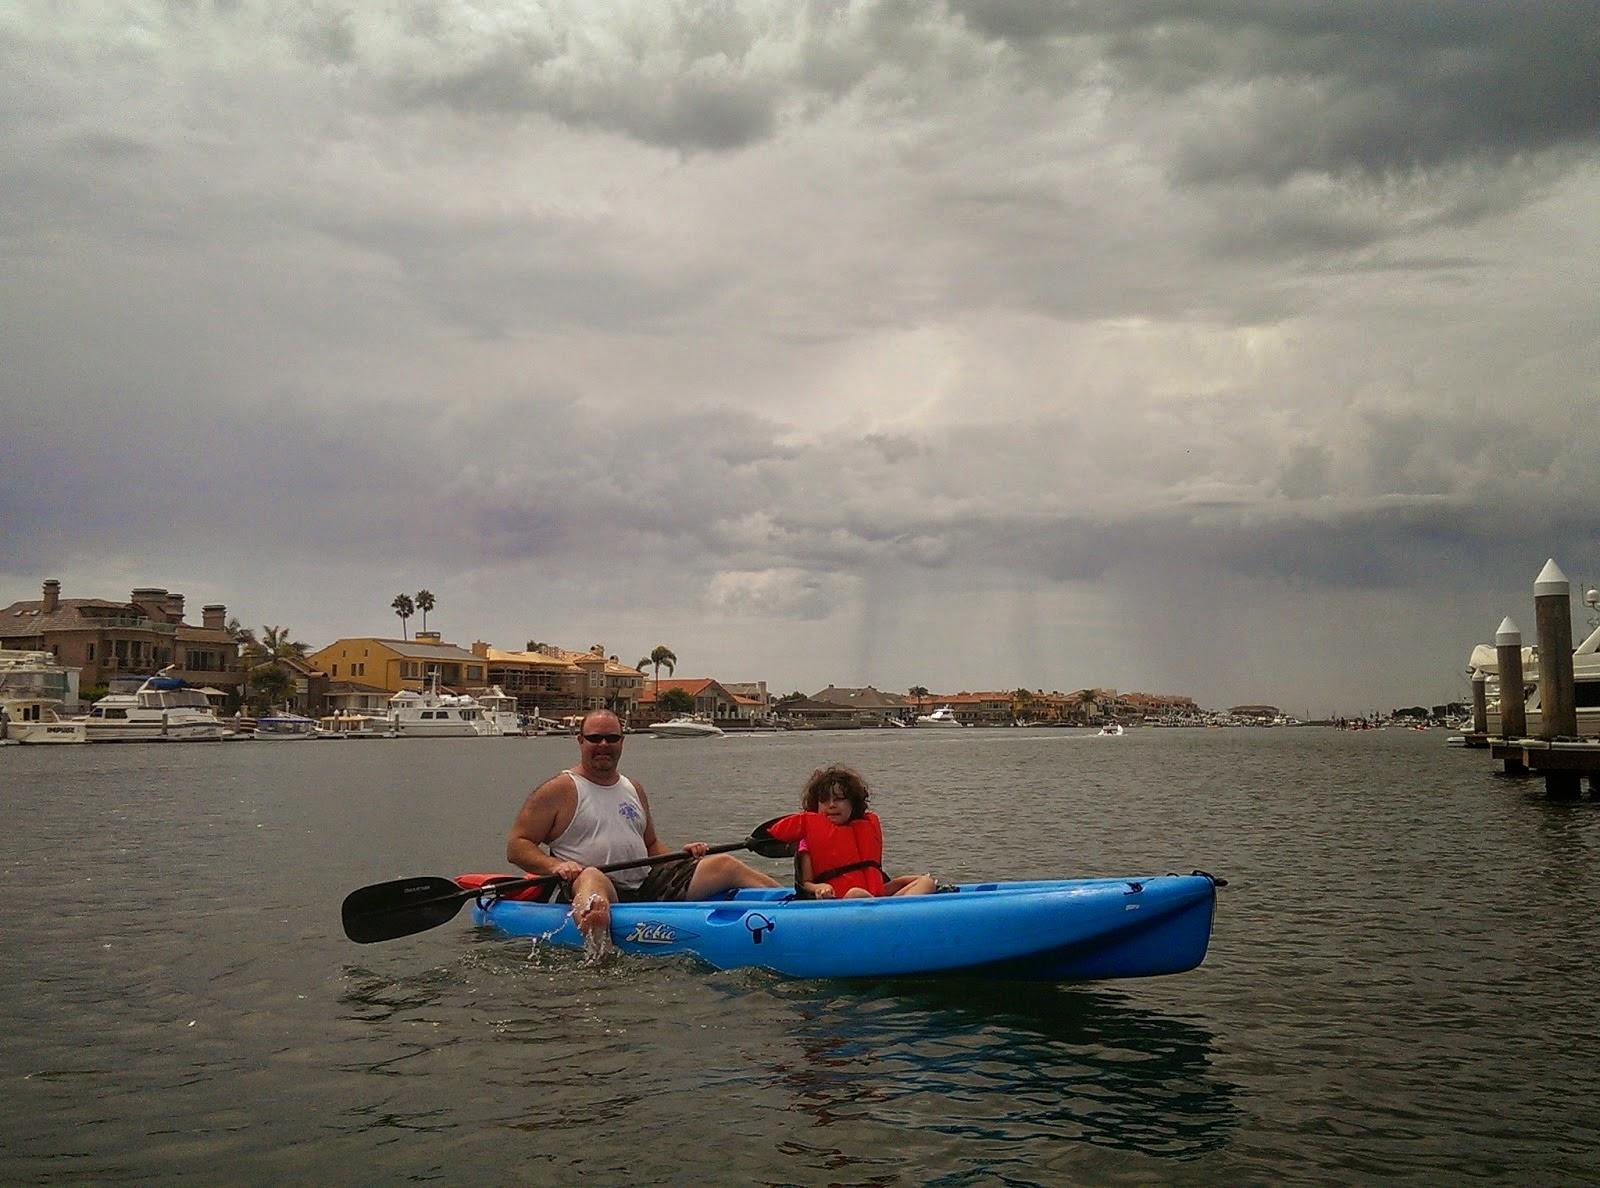 Kayaking, Stand Up Paddle Boarding, Swimming, Sunset Beach